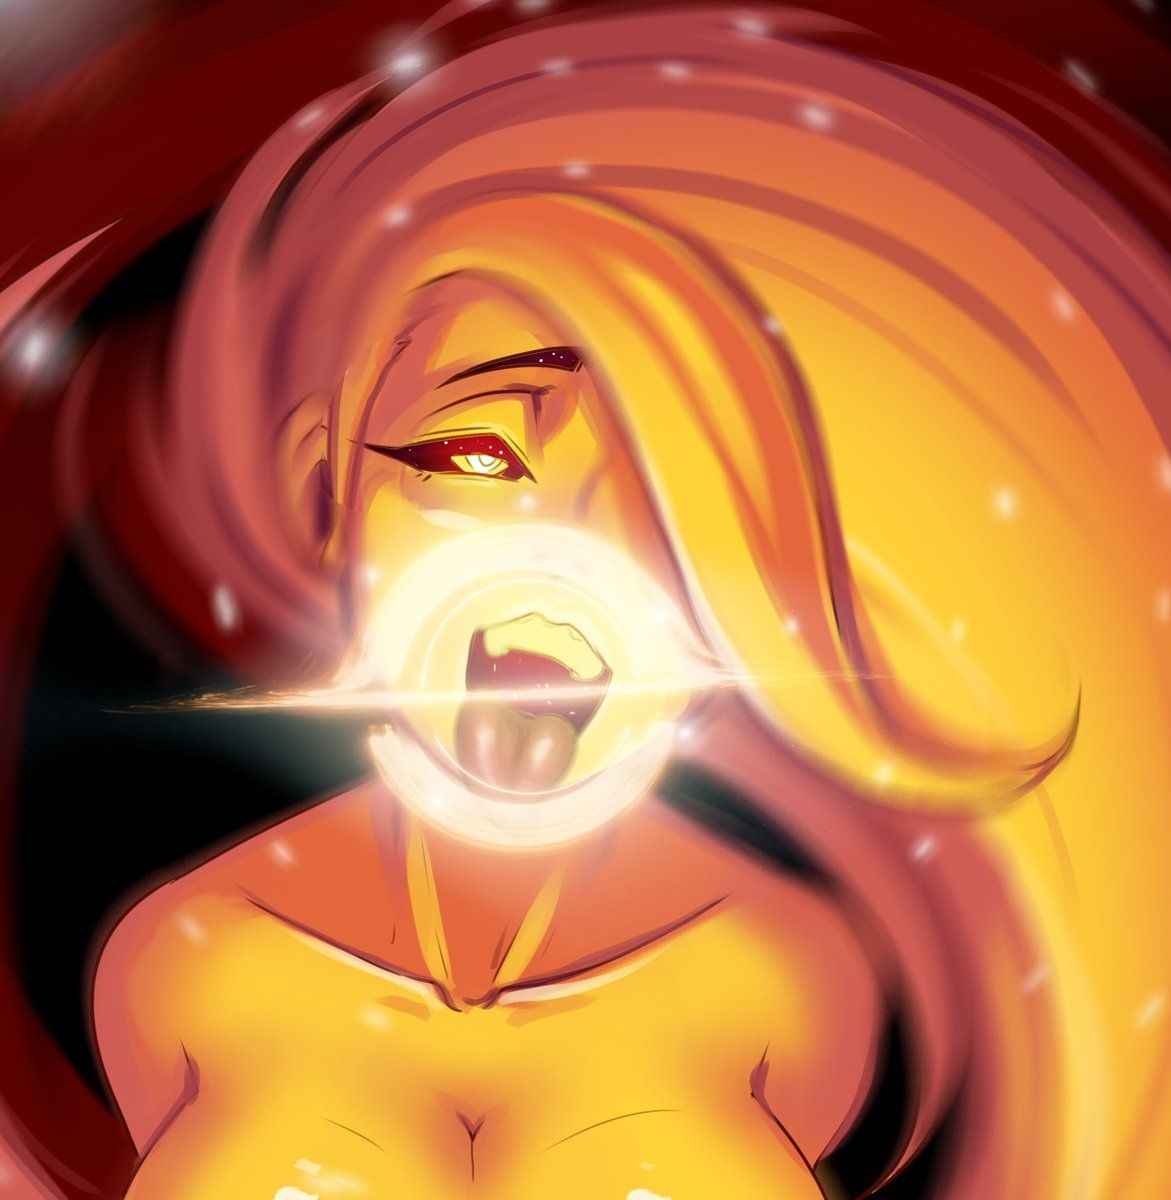 Black hole chan black hole anime funny dark fantasy art